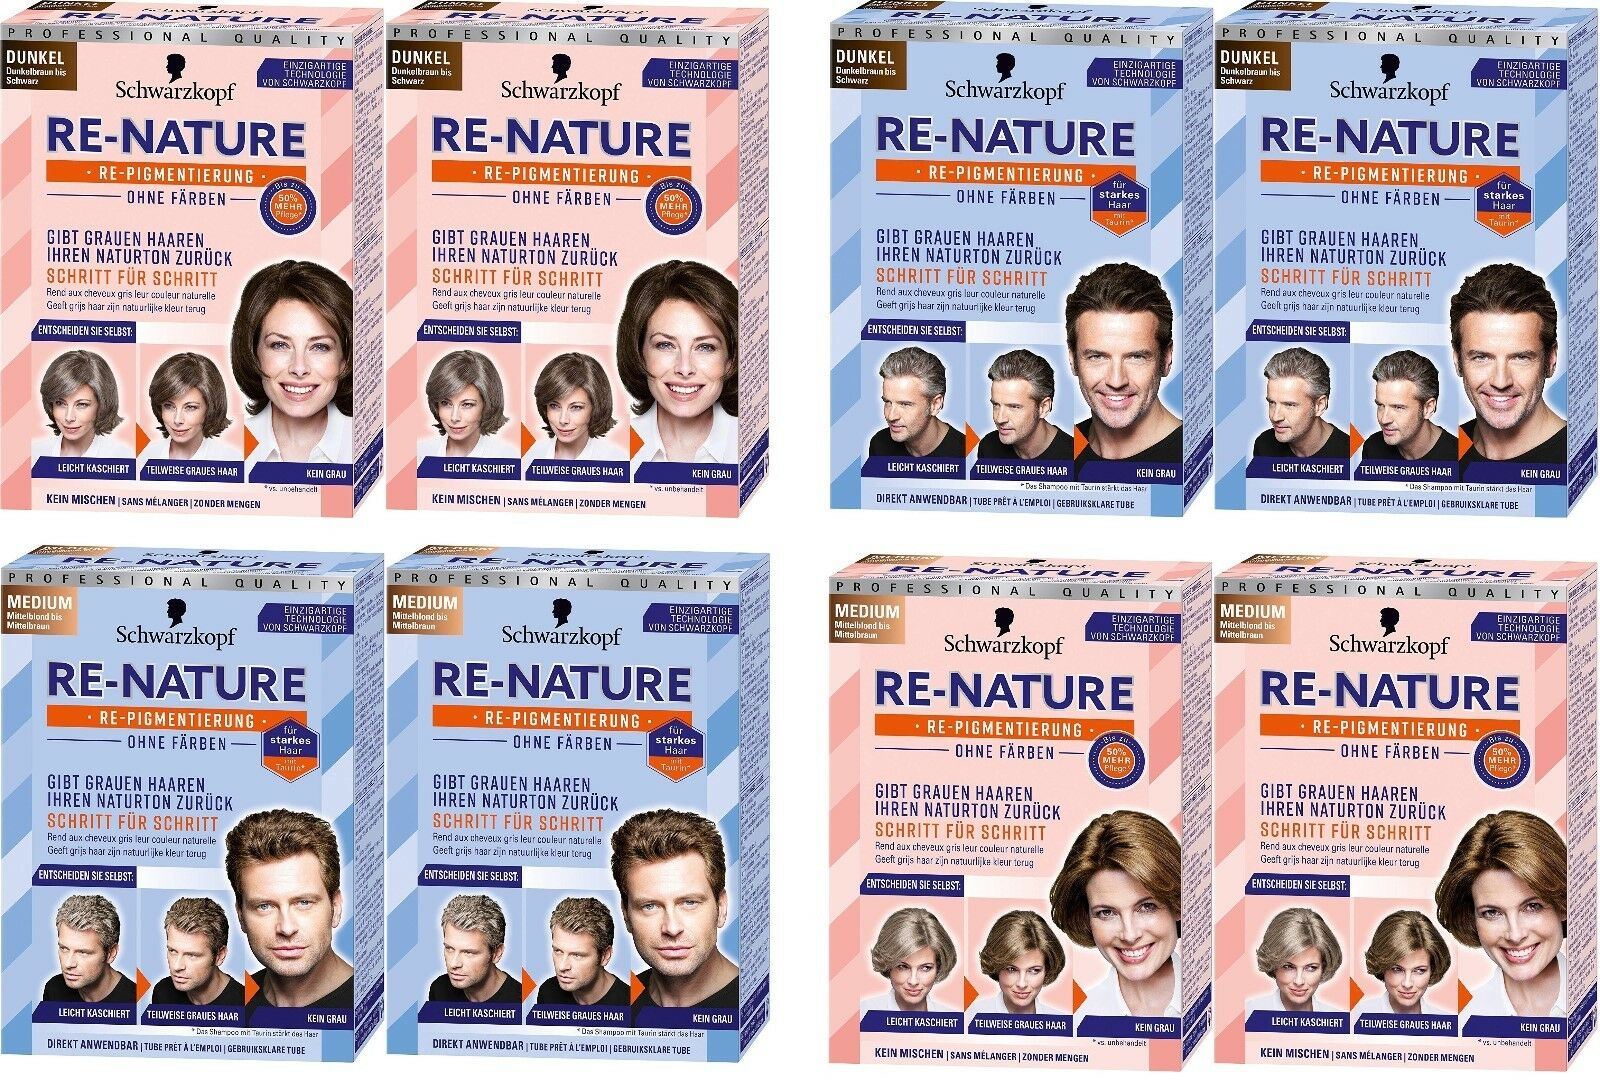 2 x Schwarzkopf RE-NATURE - Anti Gray Hair Natural Coloring